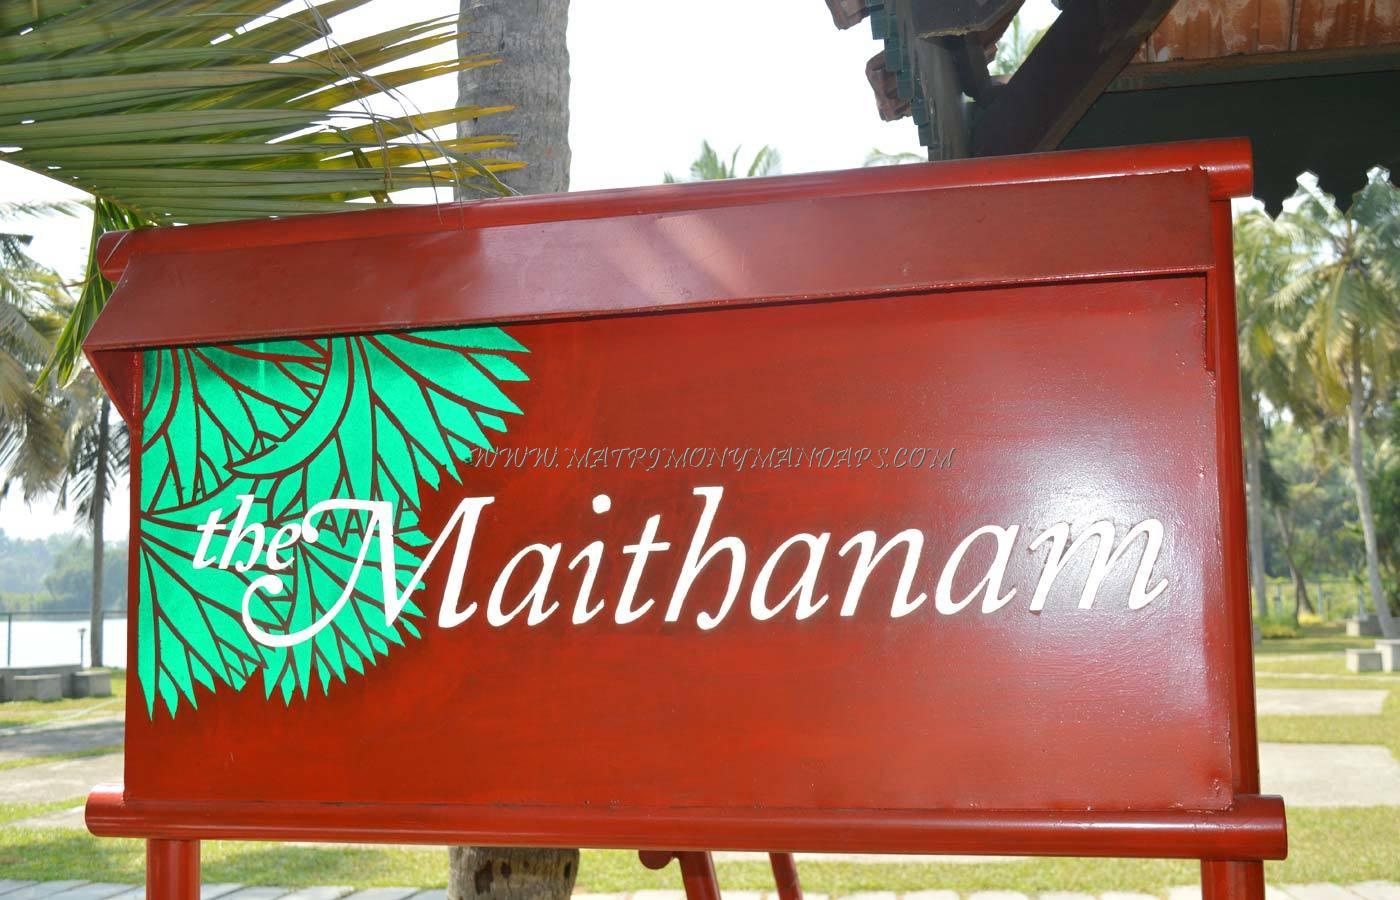 Find More Marriage Halls in Maradu